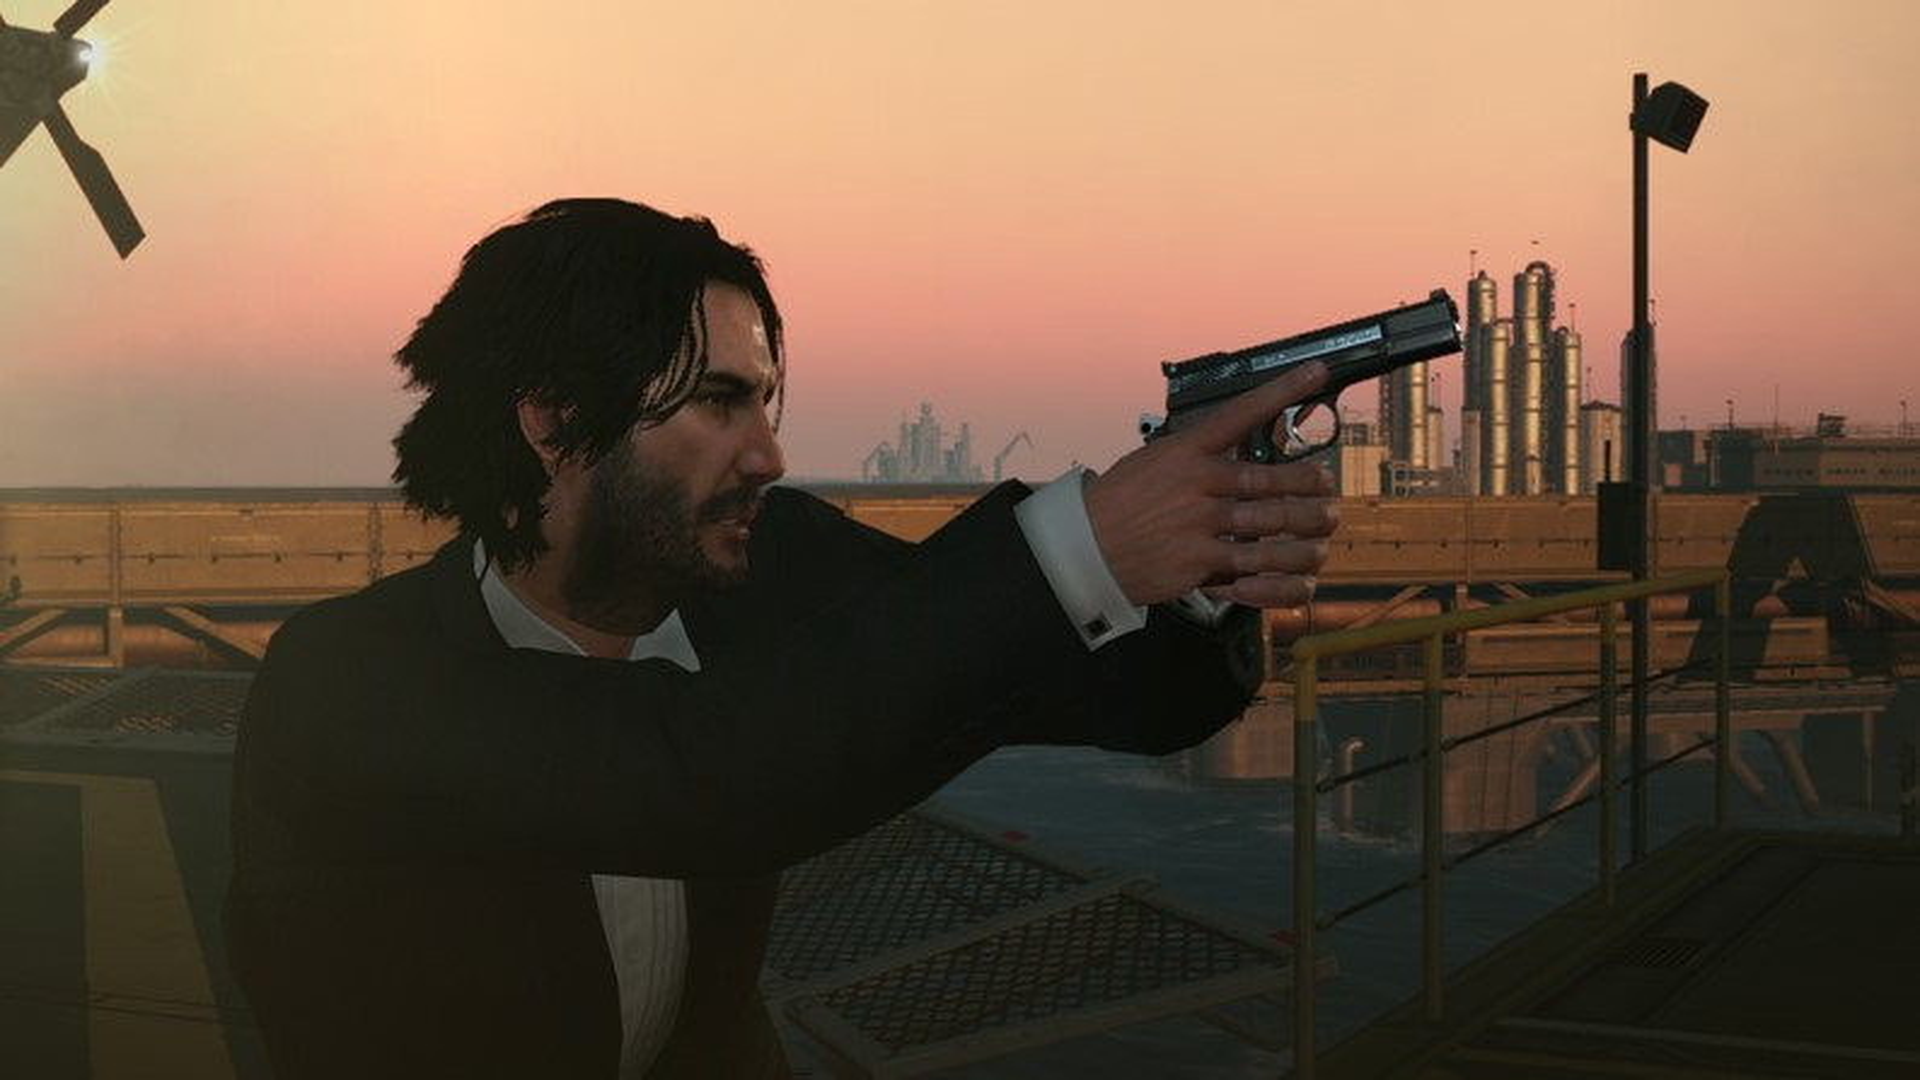 Mod de Metal Gear Solid V substitui Snake por Keanu Reeves